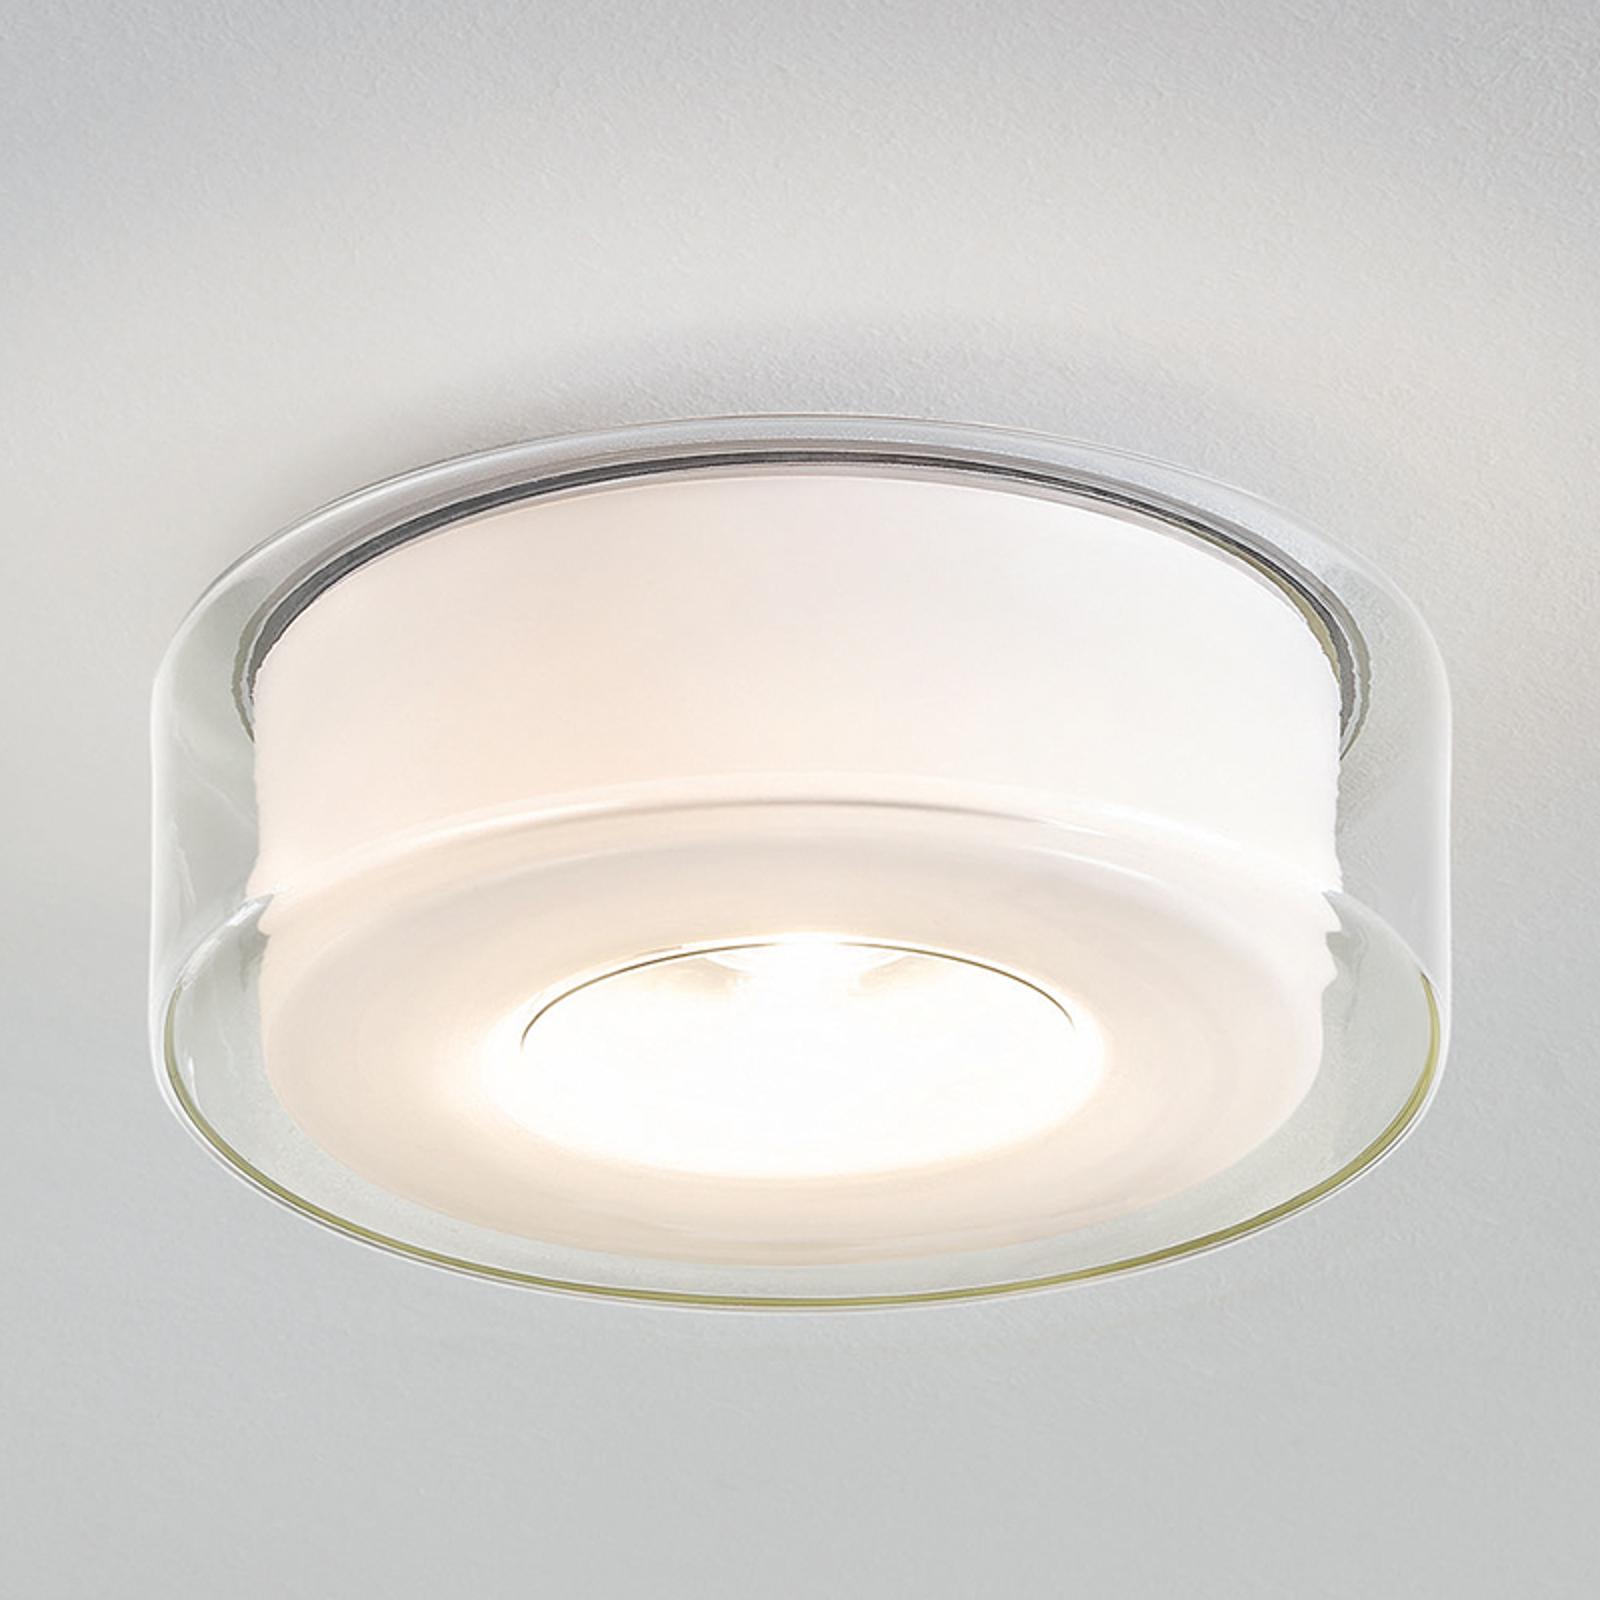 Transparante LED Designer plafondlamp Curling